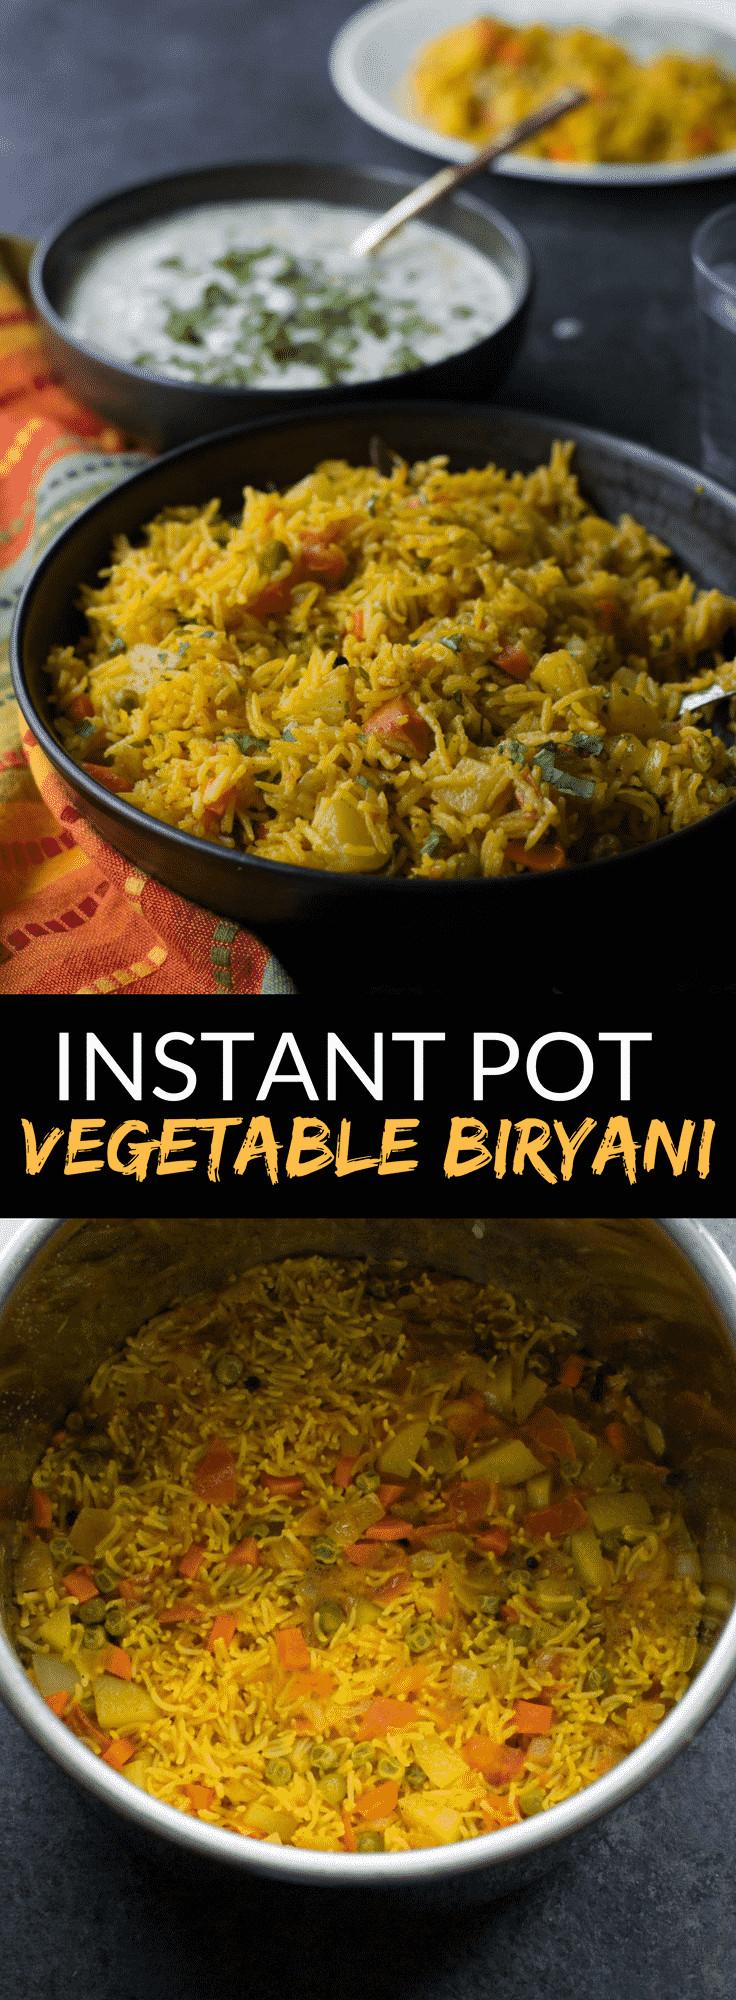 Easy Instant Pot Recipes Vegetarian  Instant Pot Ve able biryani recipe How to make veg